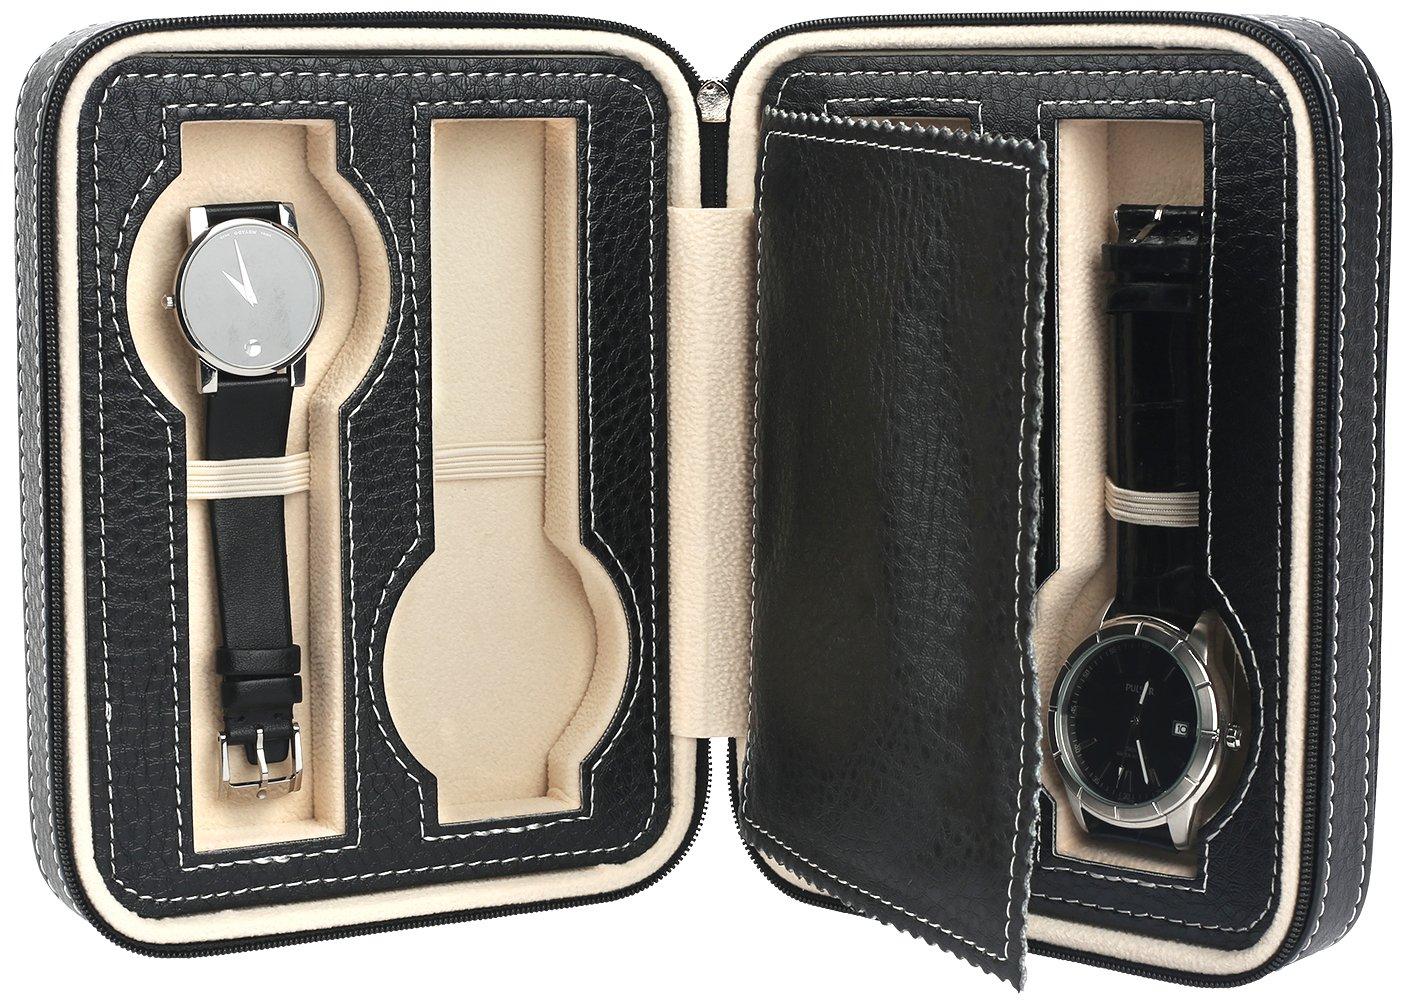 Mantello 4 Slot Leather Portable Travel Watch Case Storage Organizer, Black